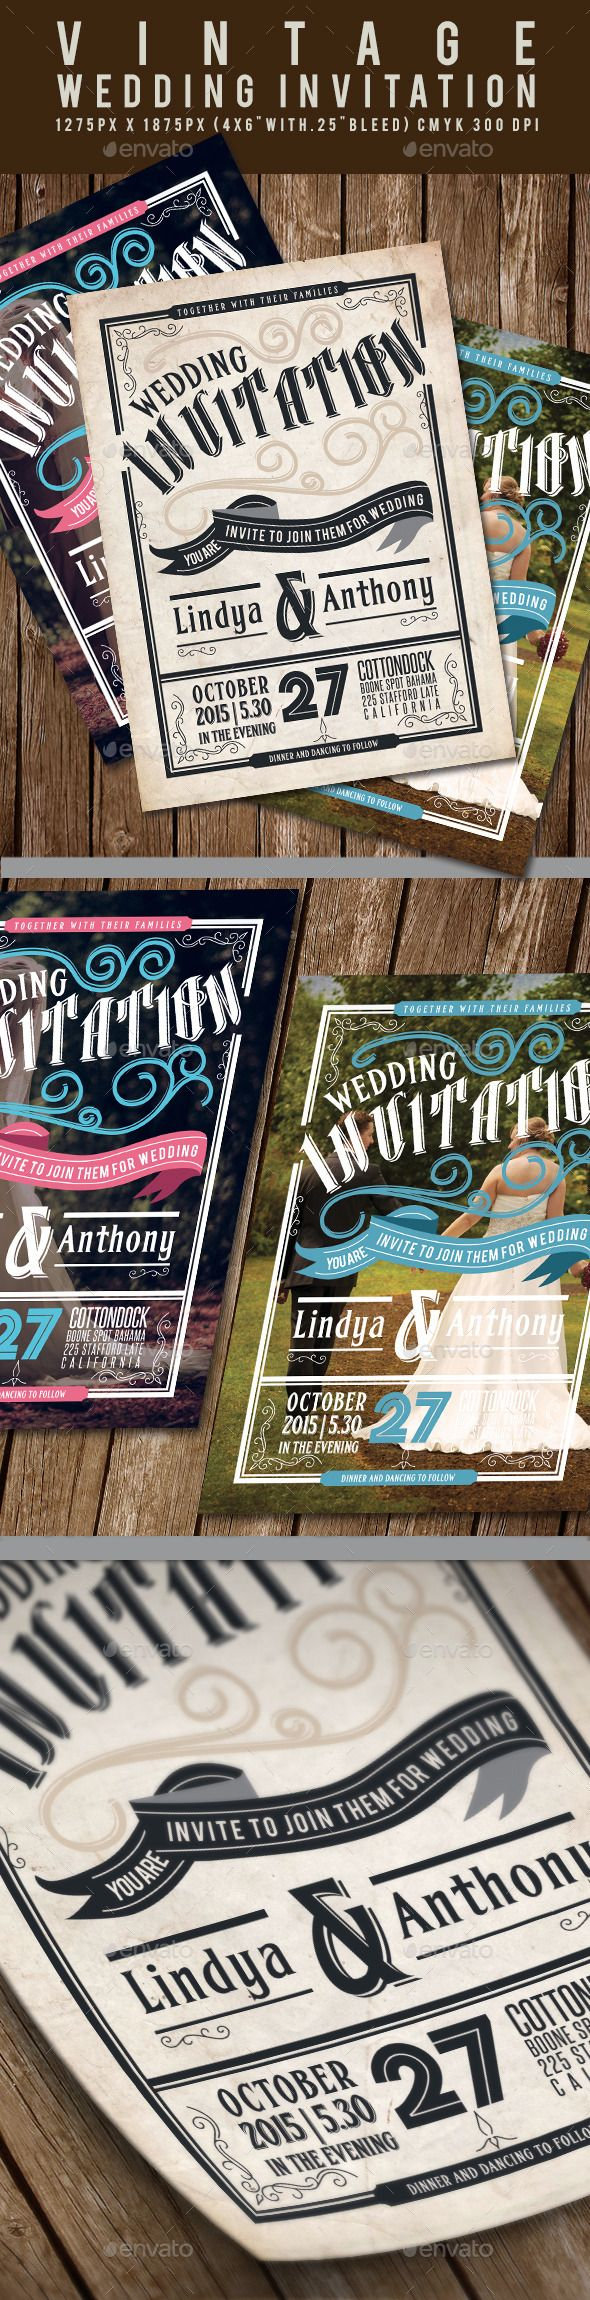 Vintage Wedding Invitation — Photoshop PSD #joy #marry • Available here → https://graphicriver.net/item/vintage-wedding-invitation/11969275?ref=pxcr